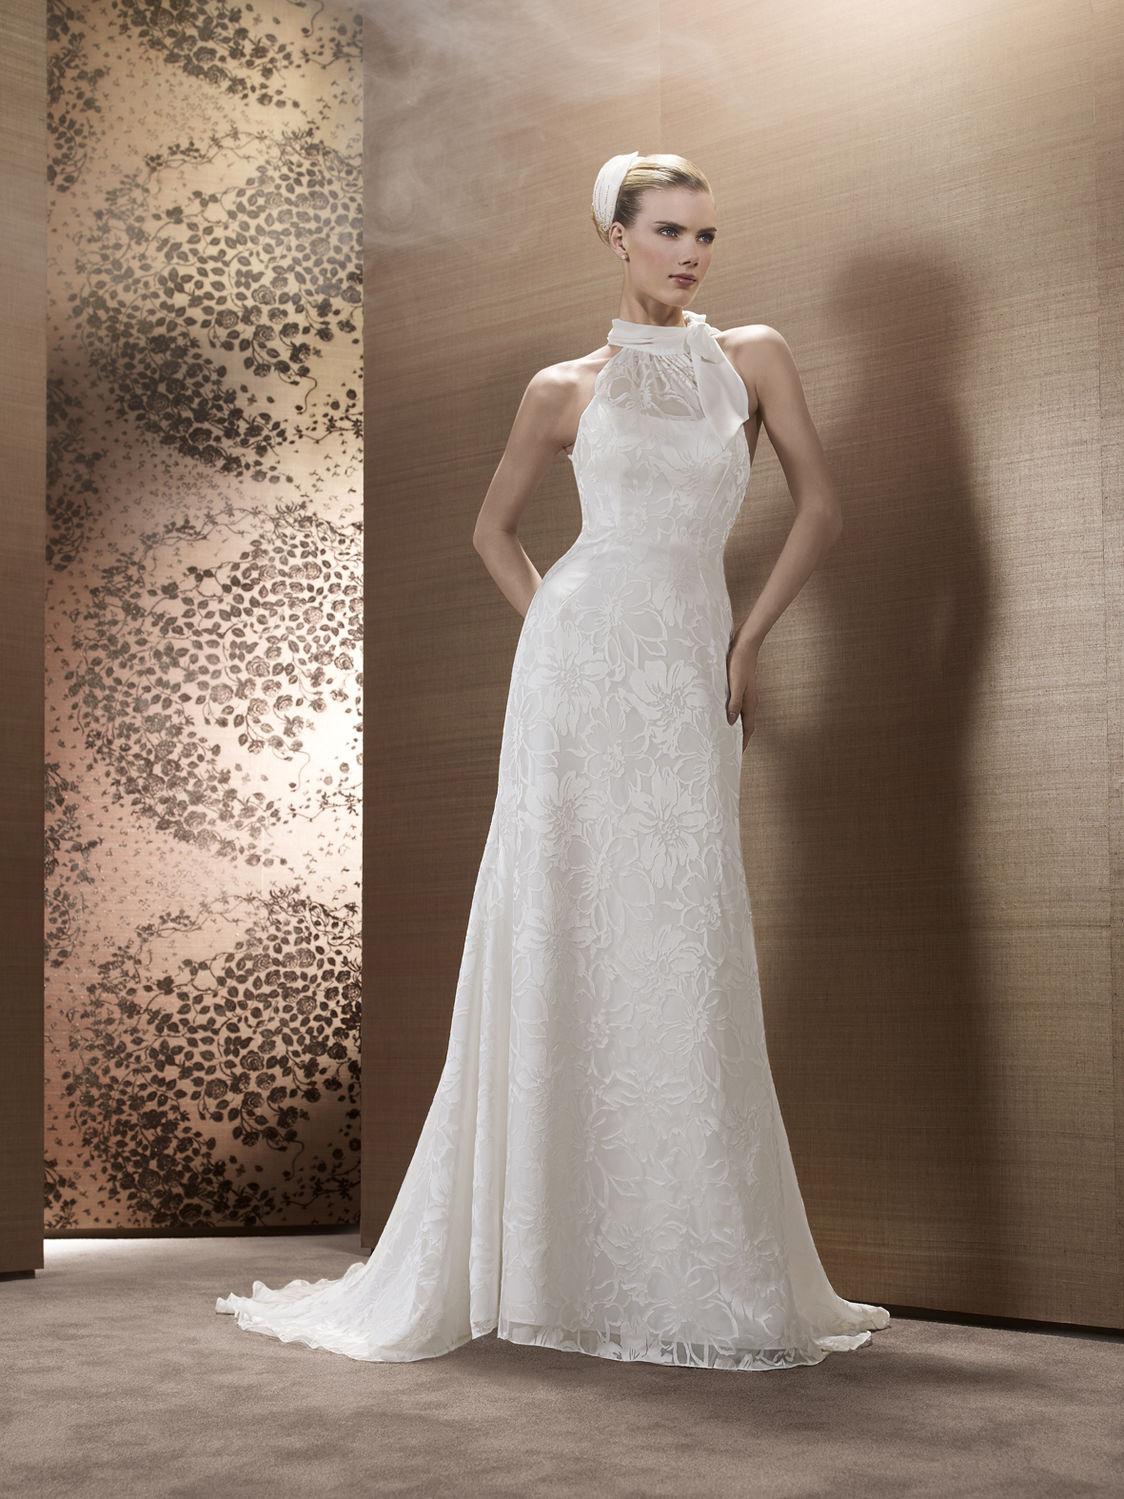 2013 wedding dress by pronuptia paris ke78 for Wedding dress in paris